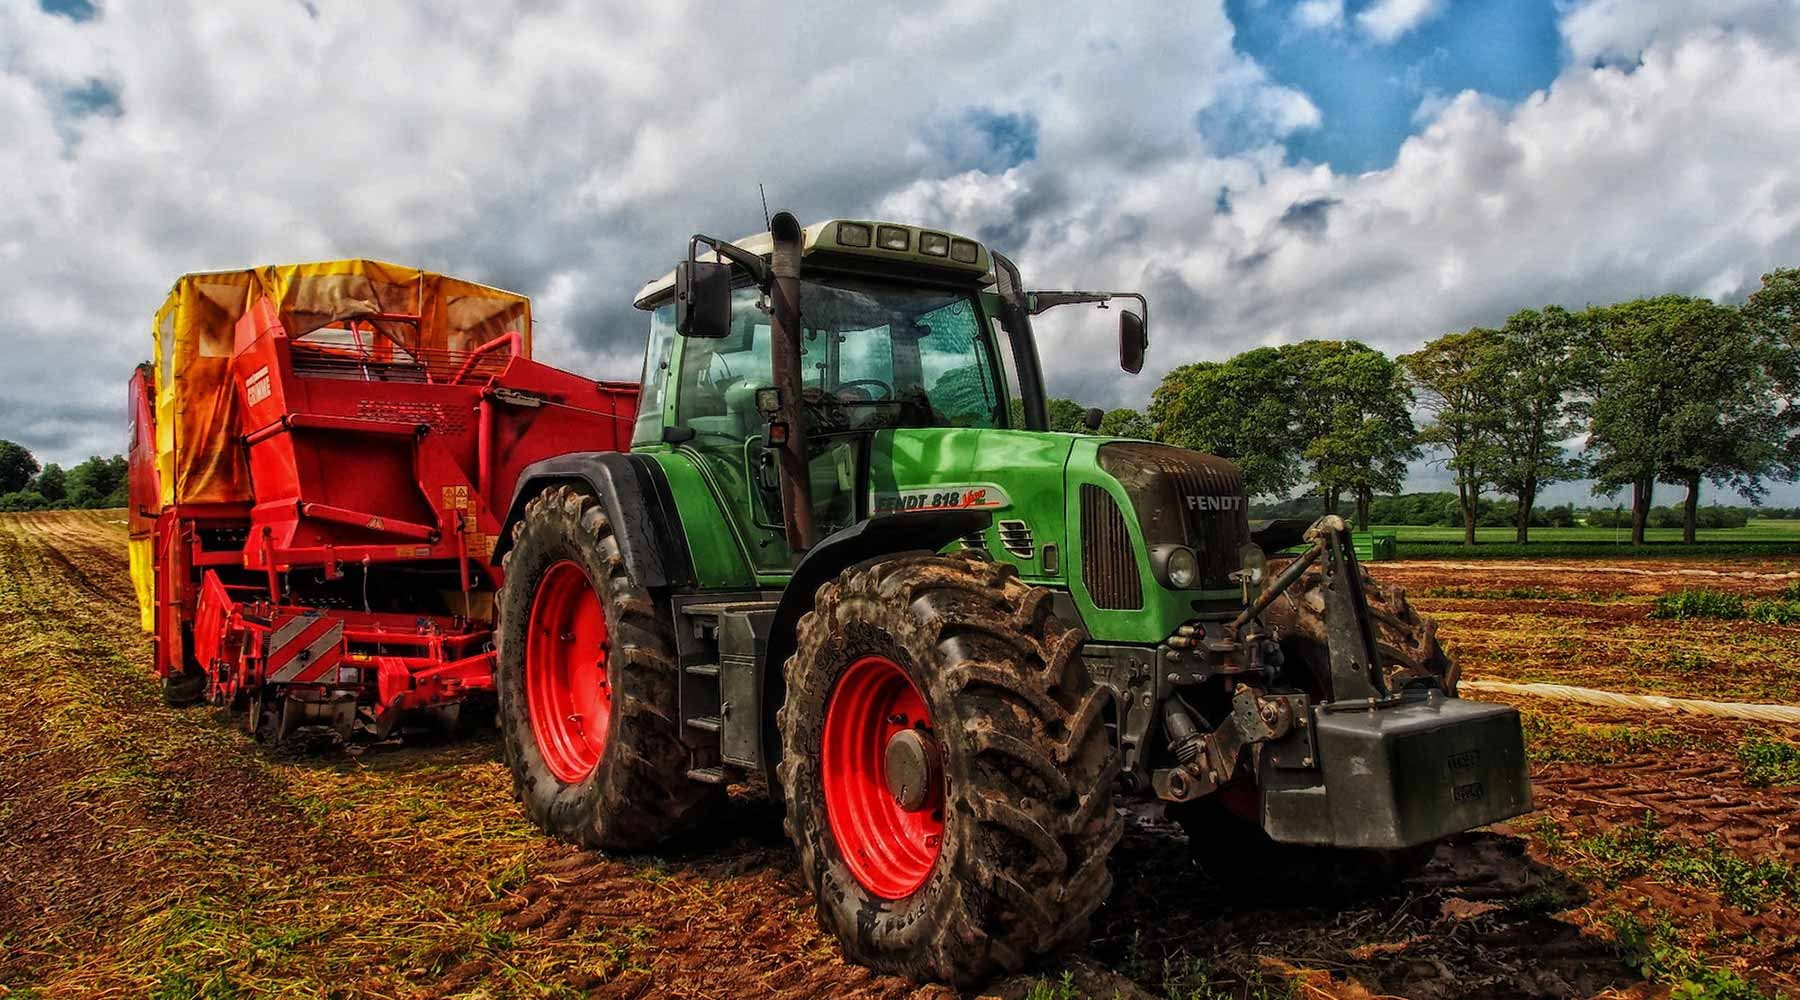 Farming Tour of the British Isles